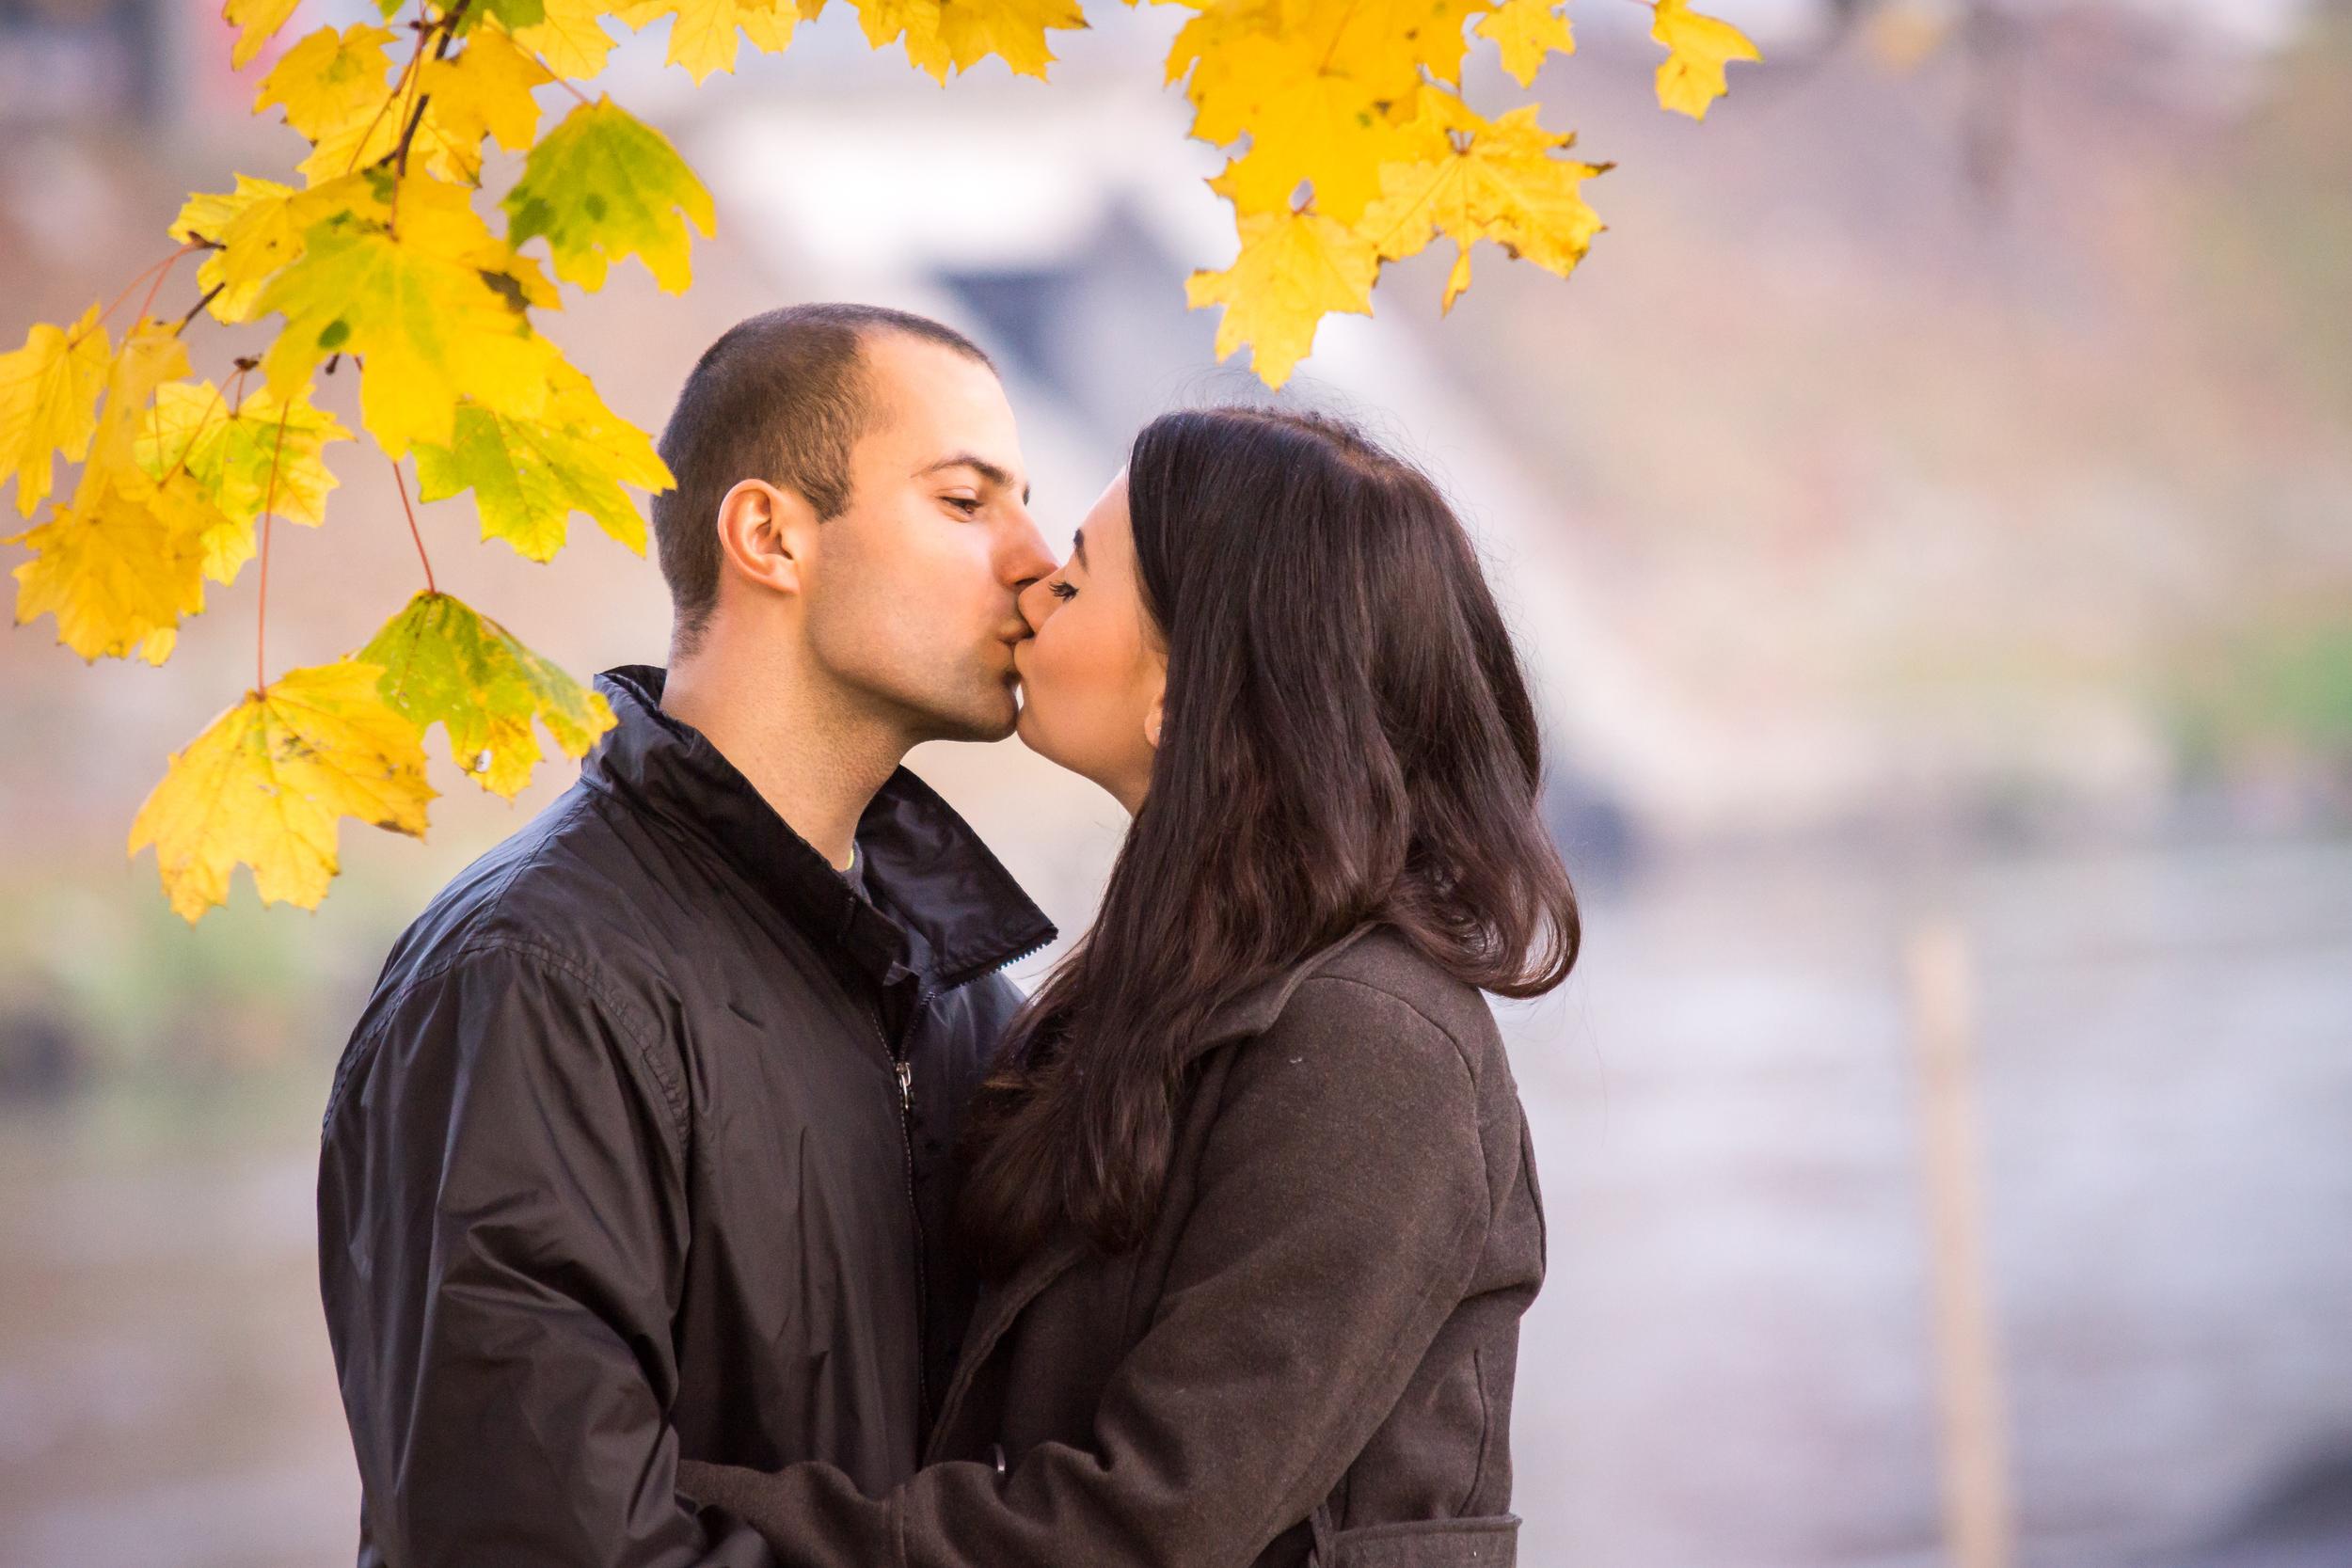 Pocałunek w parku - fotograf Marcin Górski